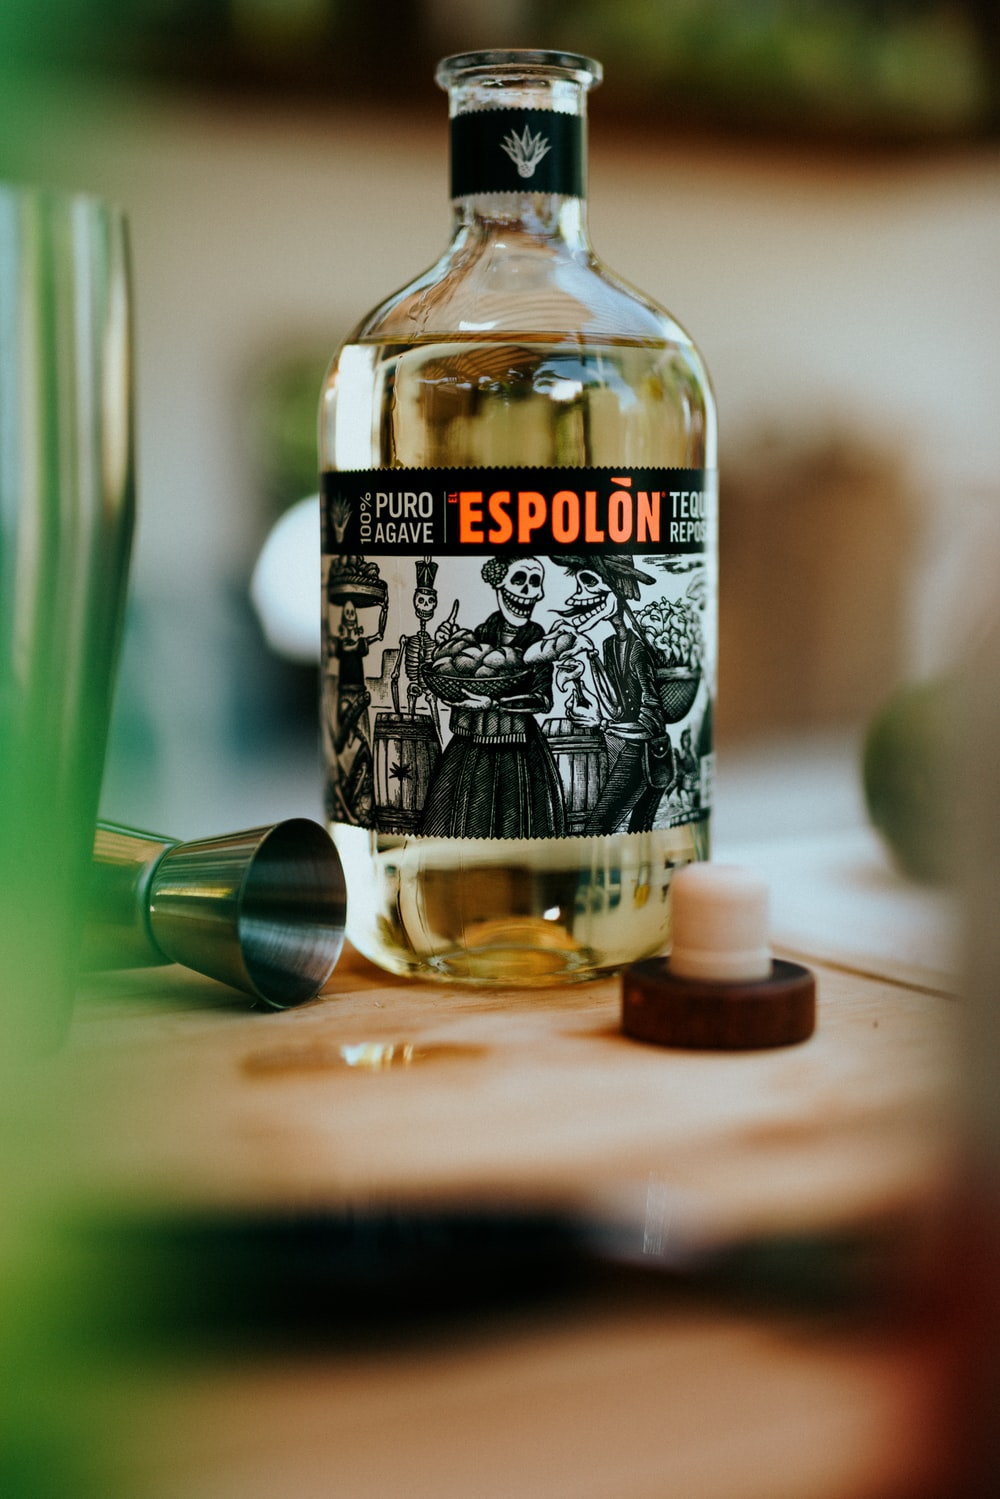 Espolòn Tequila labeled bottle